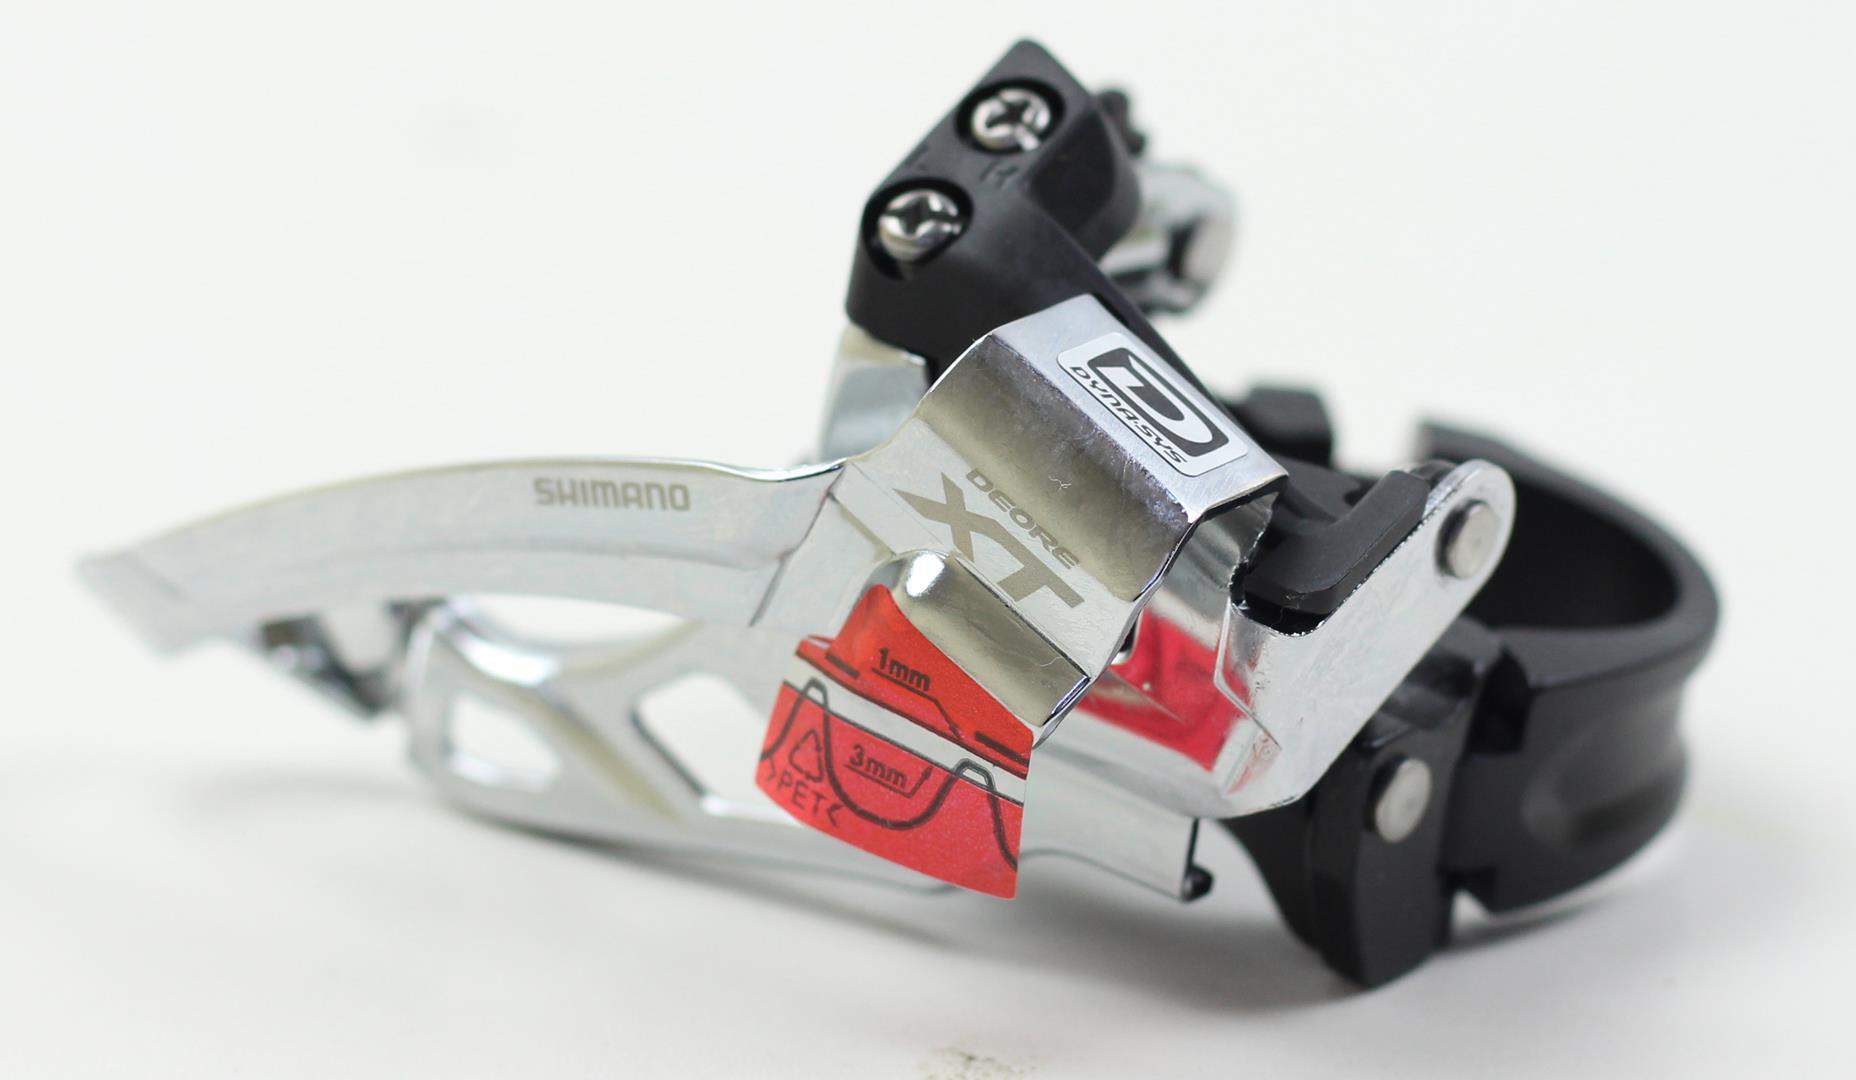 Cambio Dianteiro Shimano Deore XT M785 2x10 34.9 31.8mm 10 velocidades Dual Pull